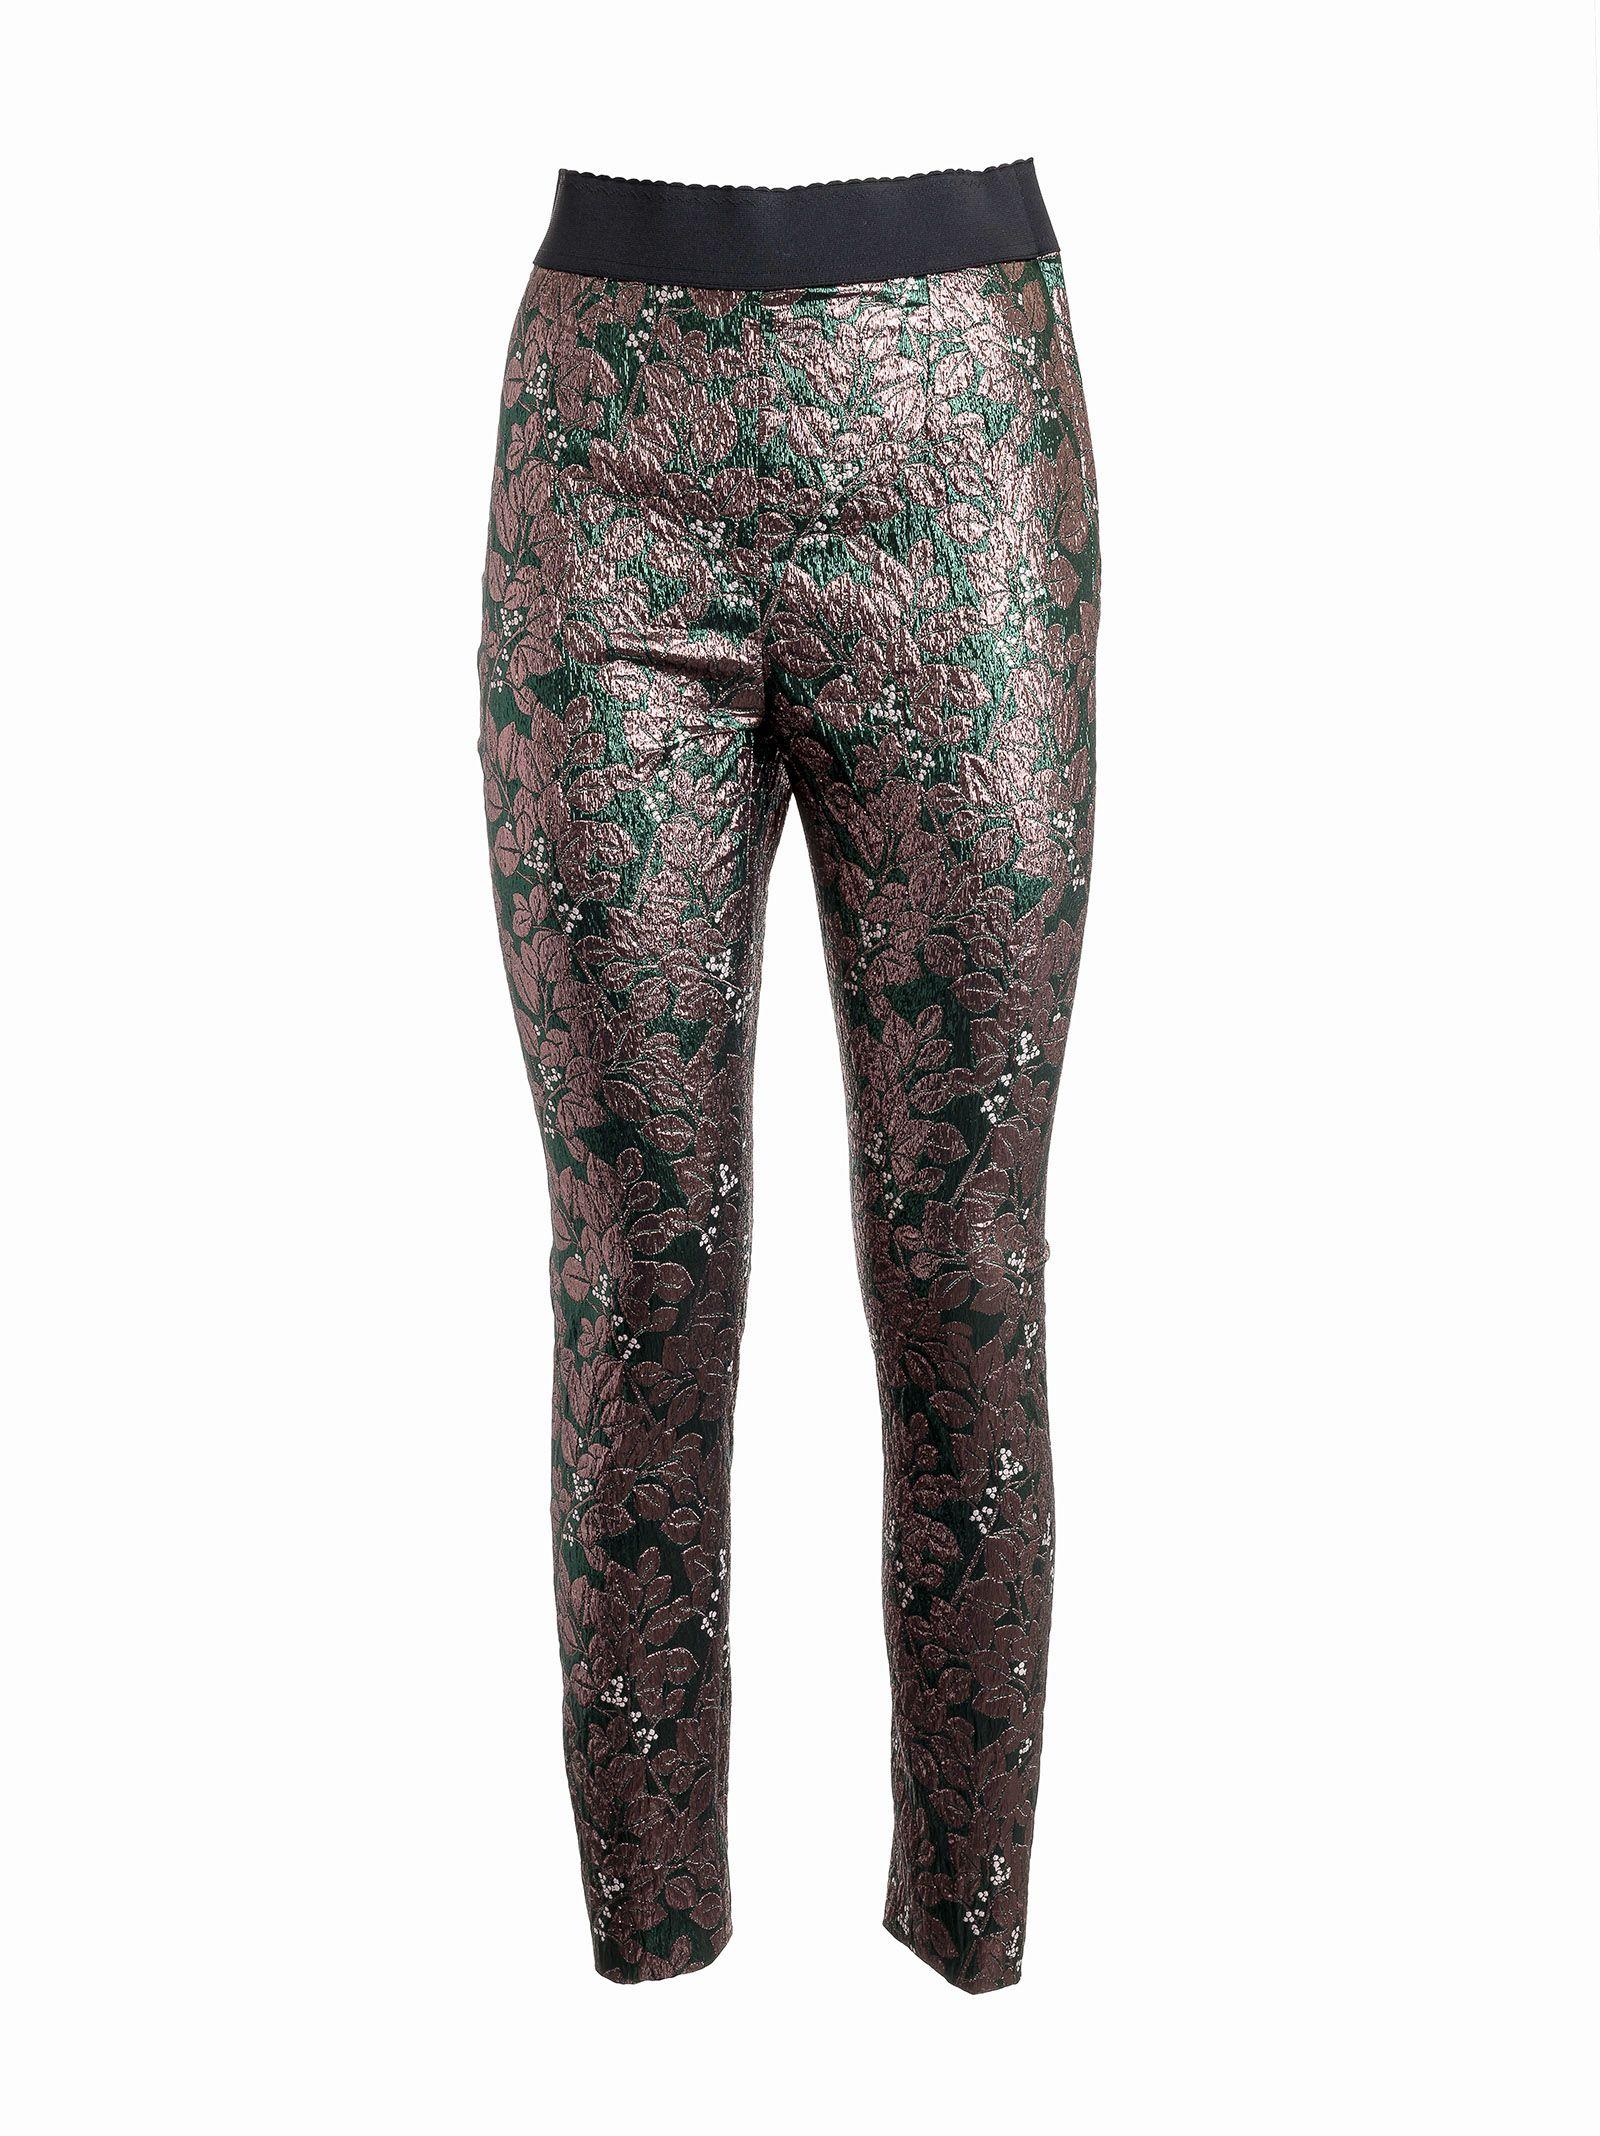 Dolce & Gabbana Leaf Print Trousers